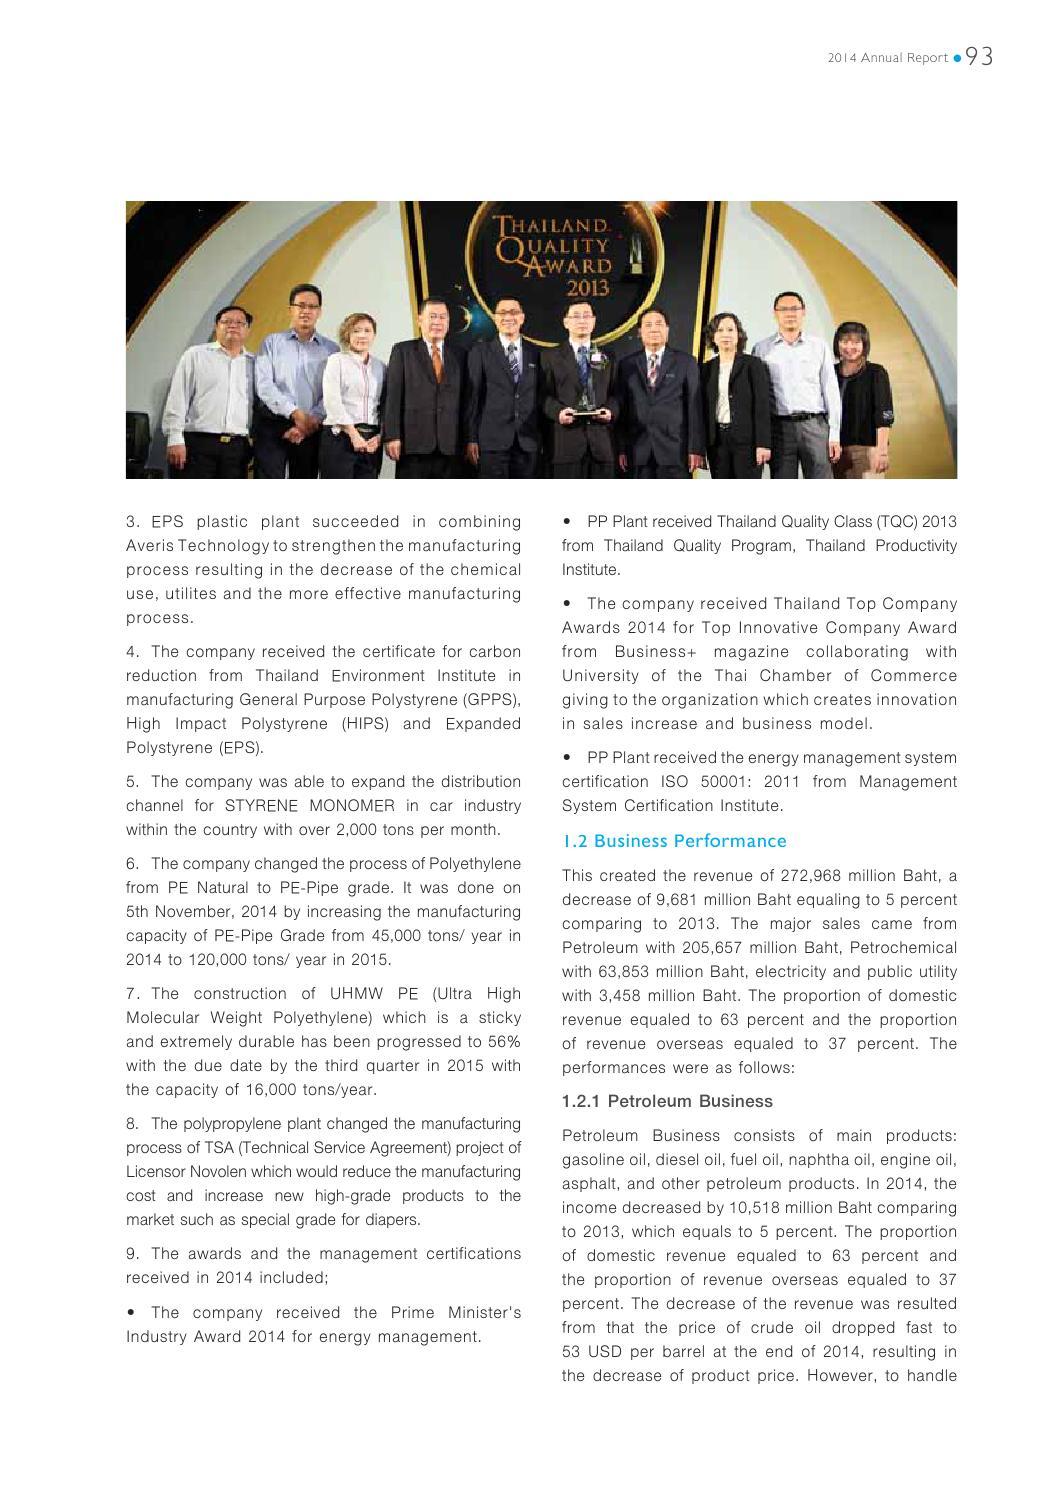 Irpc Annual Report 2014 By Orapan Shareinvestor Issuu